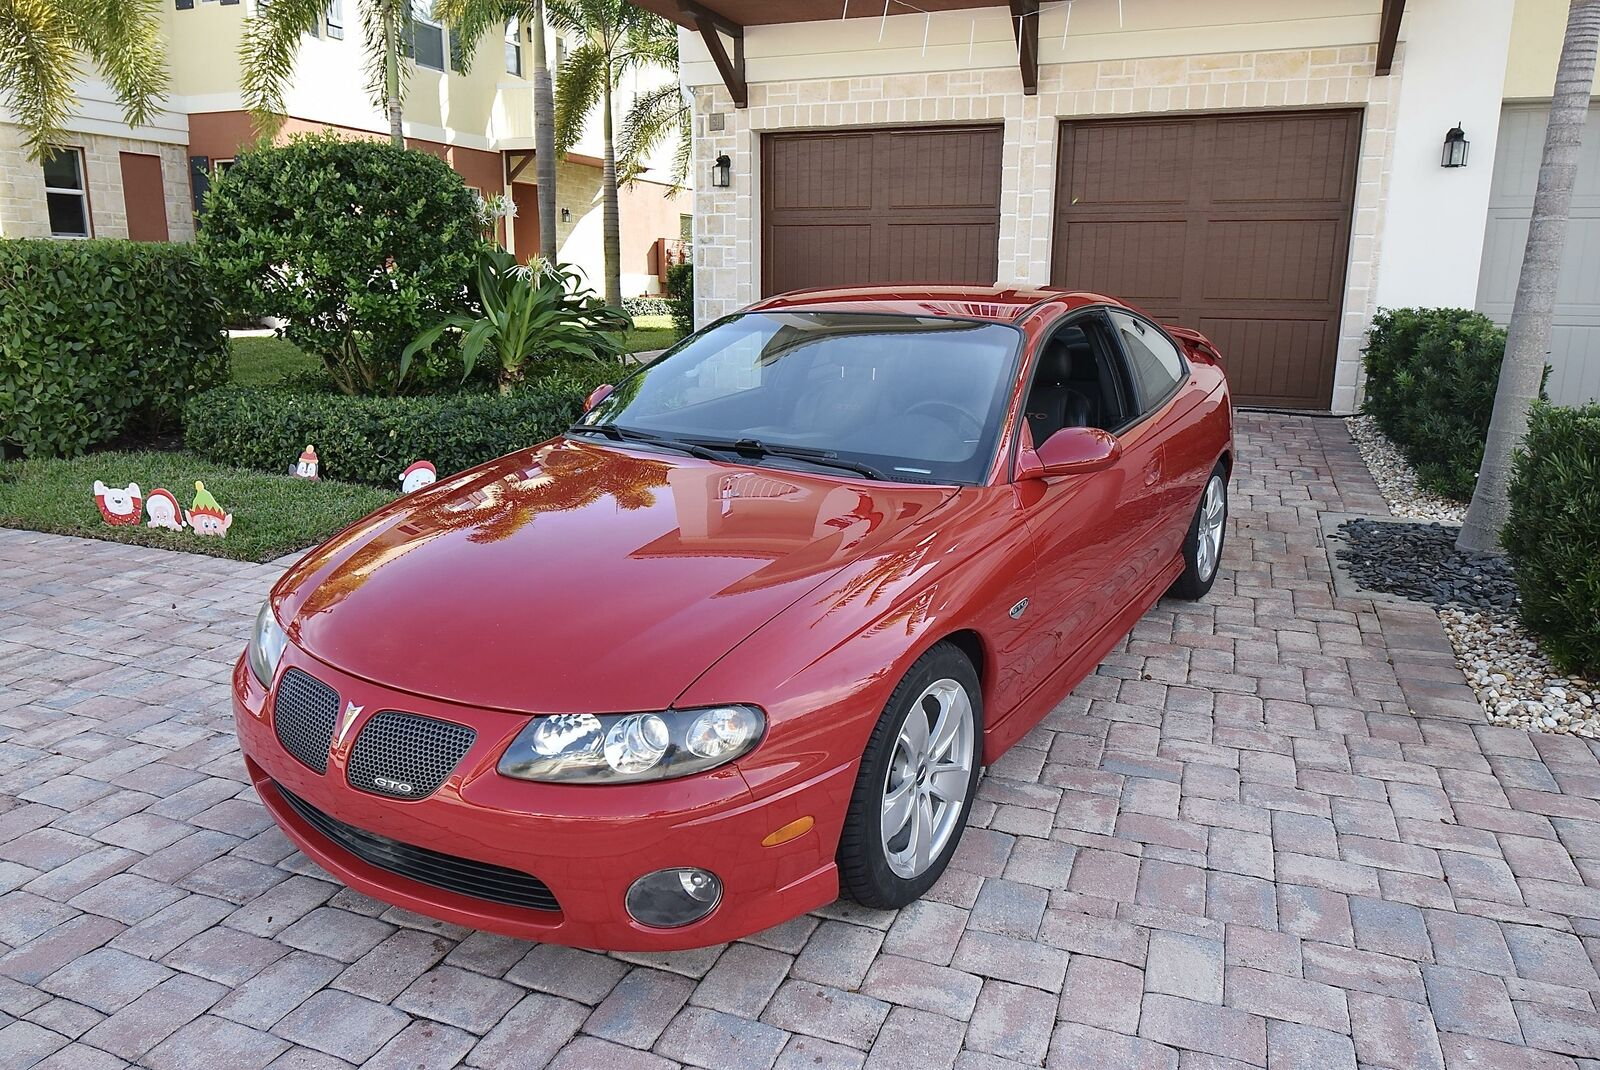 2004 Pontiac GTO 5.7L LS V8